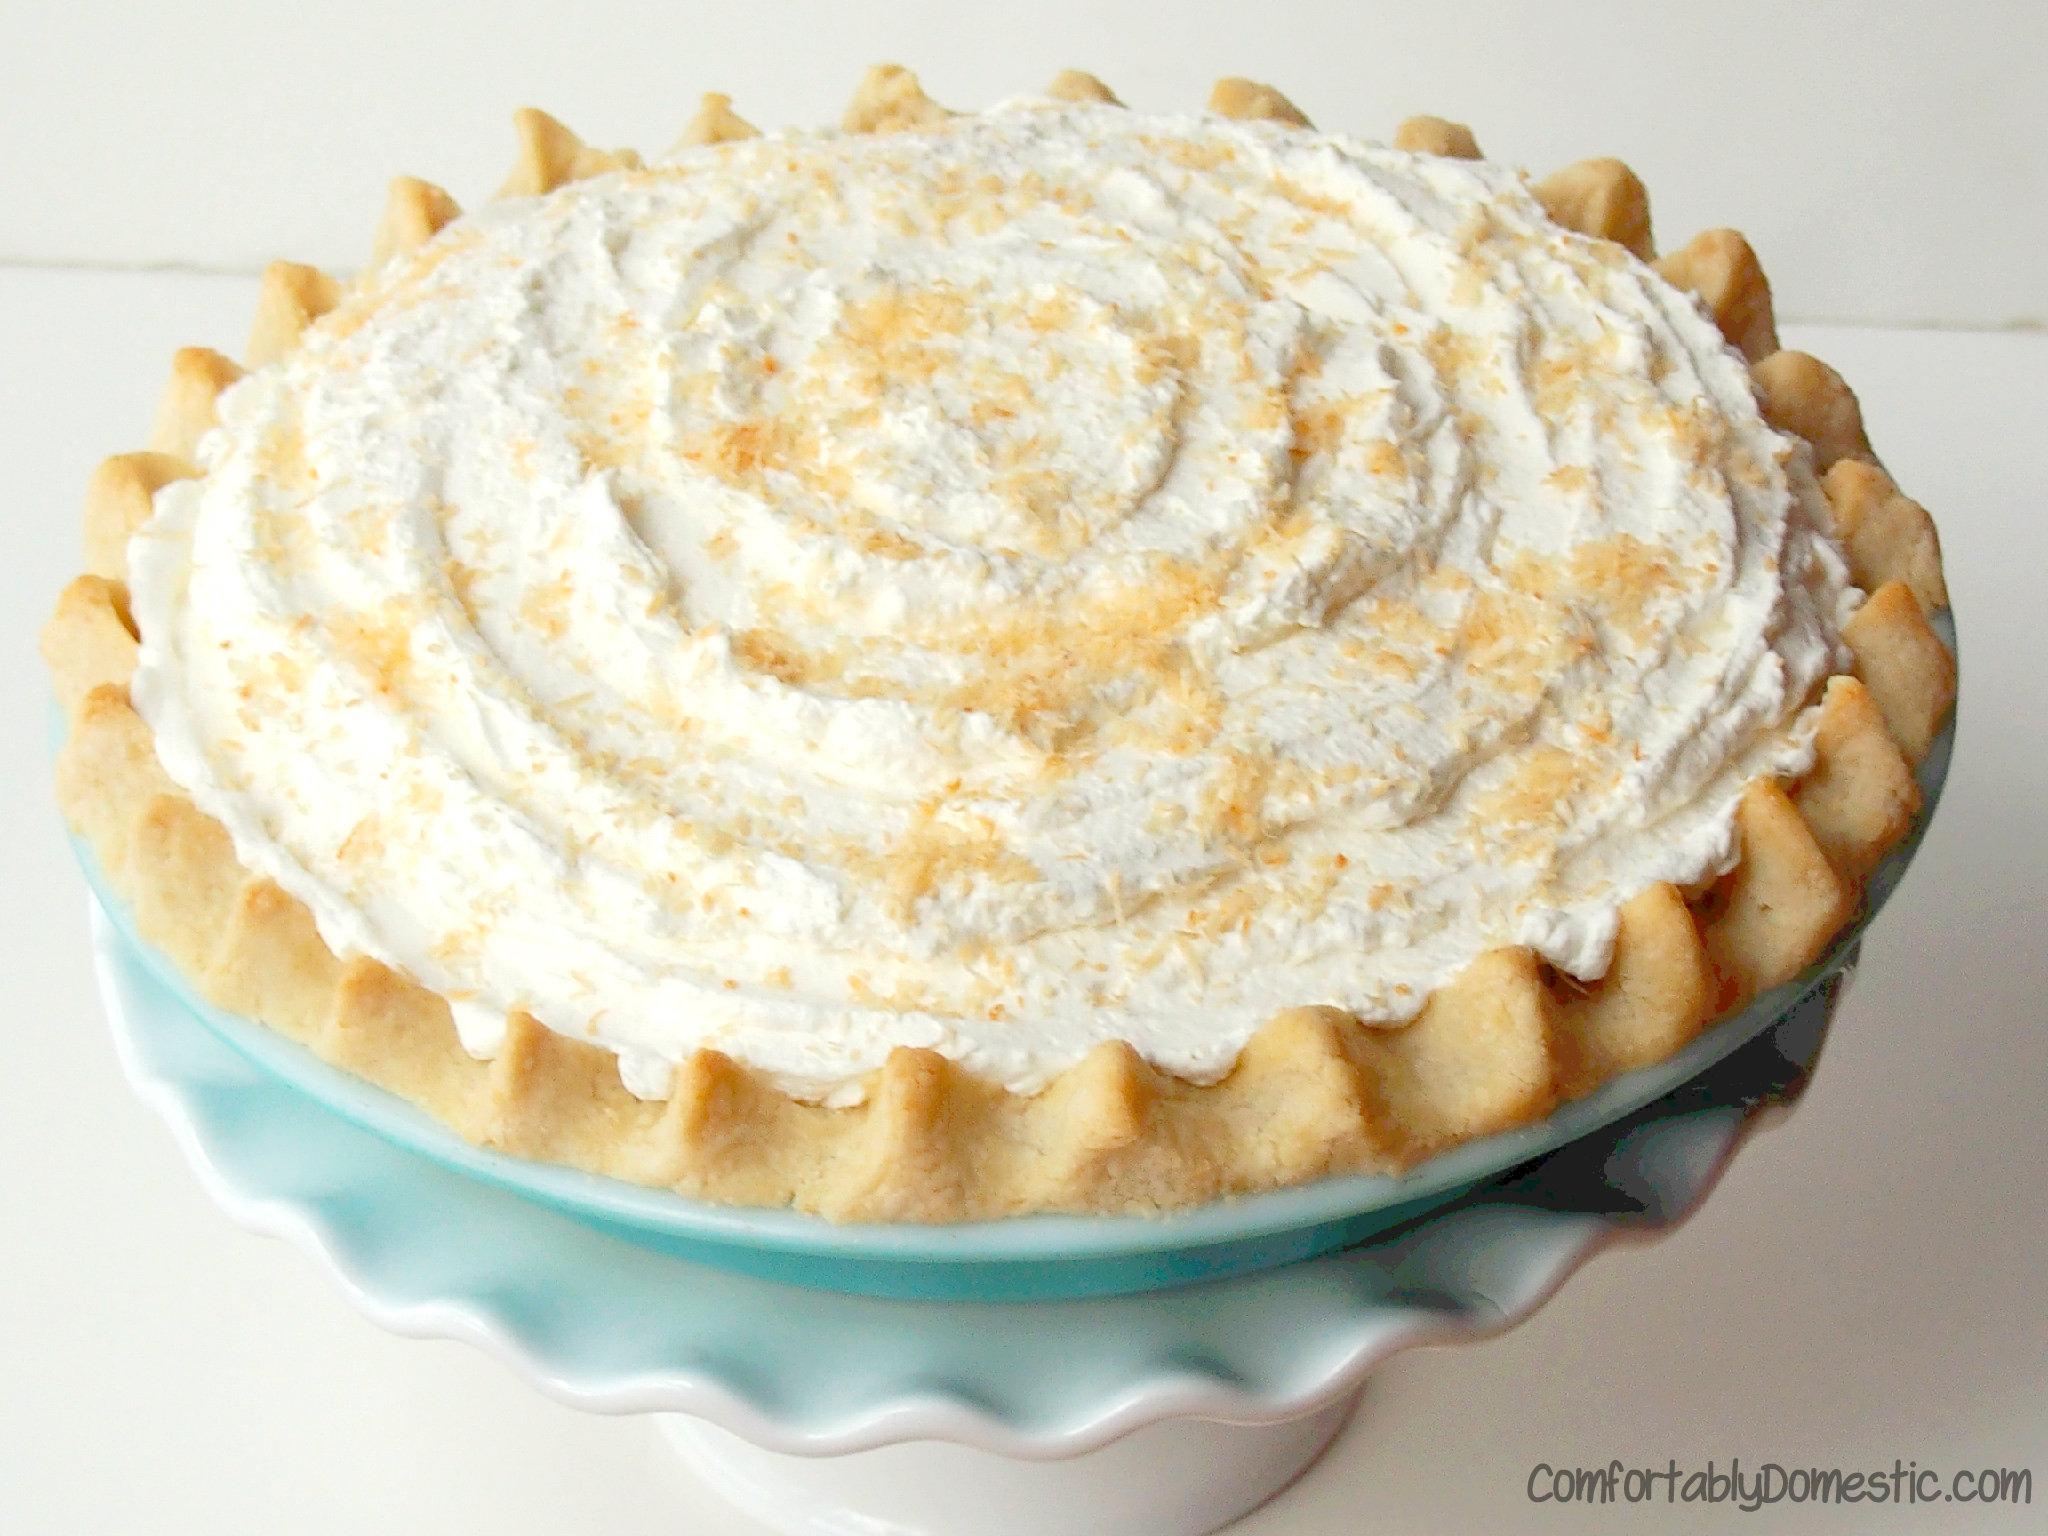 Coconut Shell Fat Cake Site Rspb Org Uk